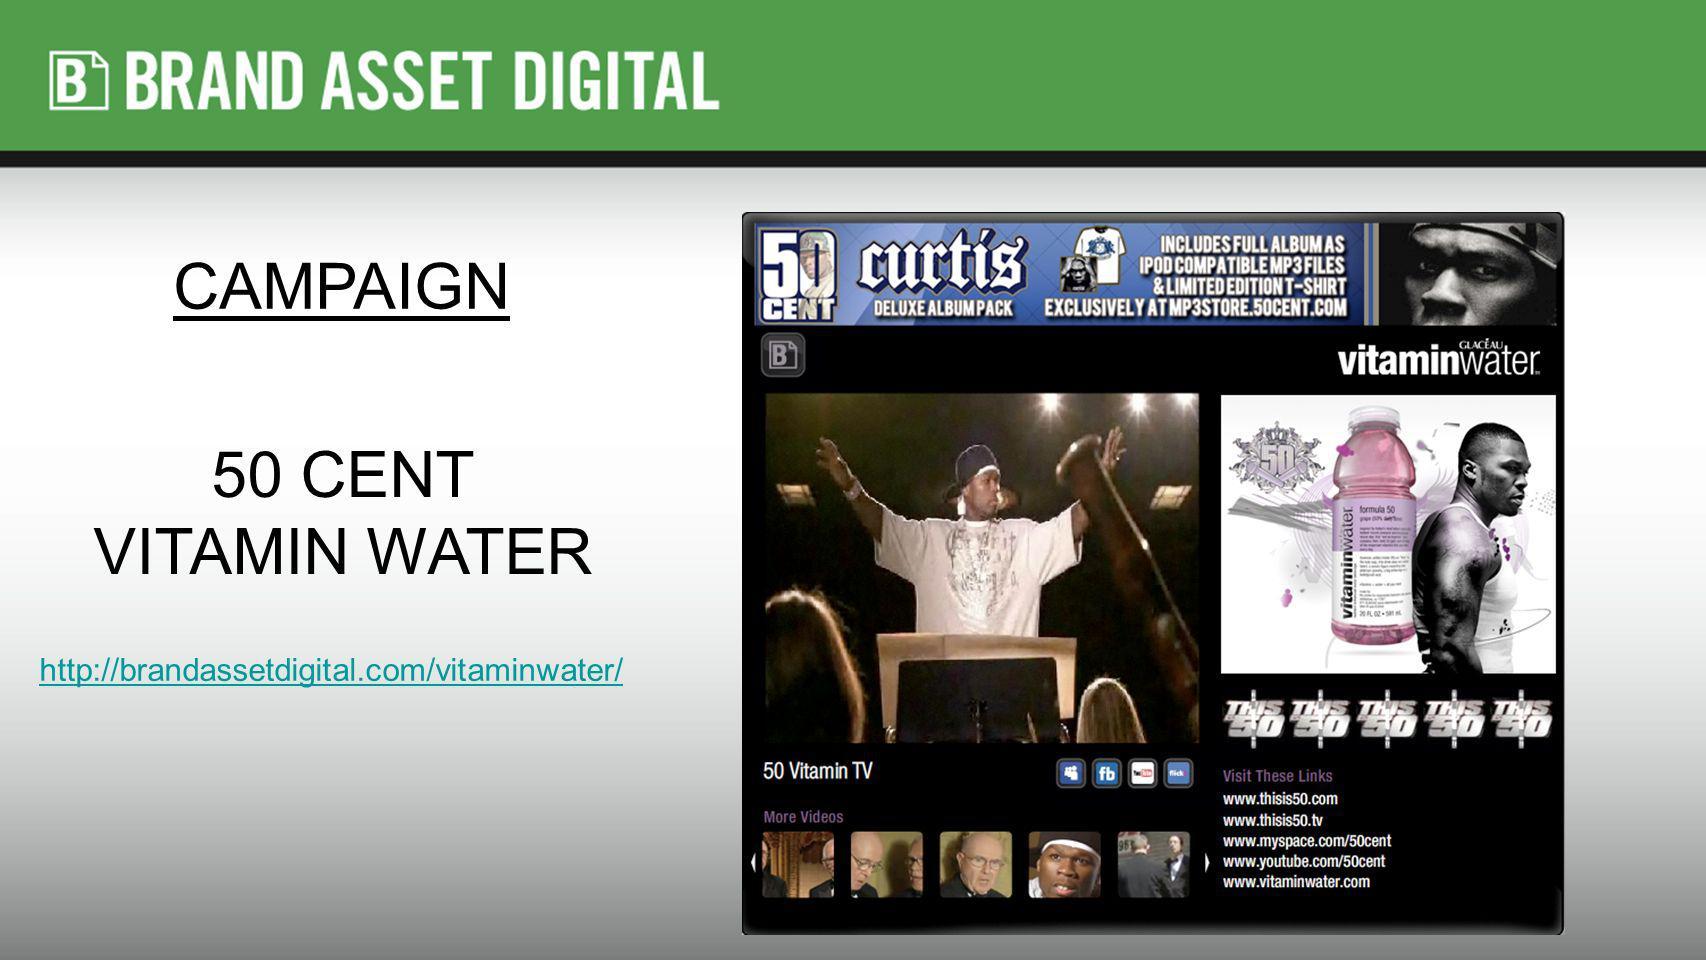 http://brandassetdigital.com/vitaminwater/ 50 CENT VITAMIN WATER CAMPAIGN